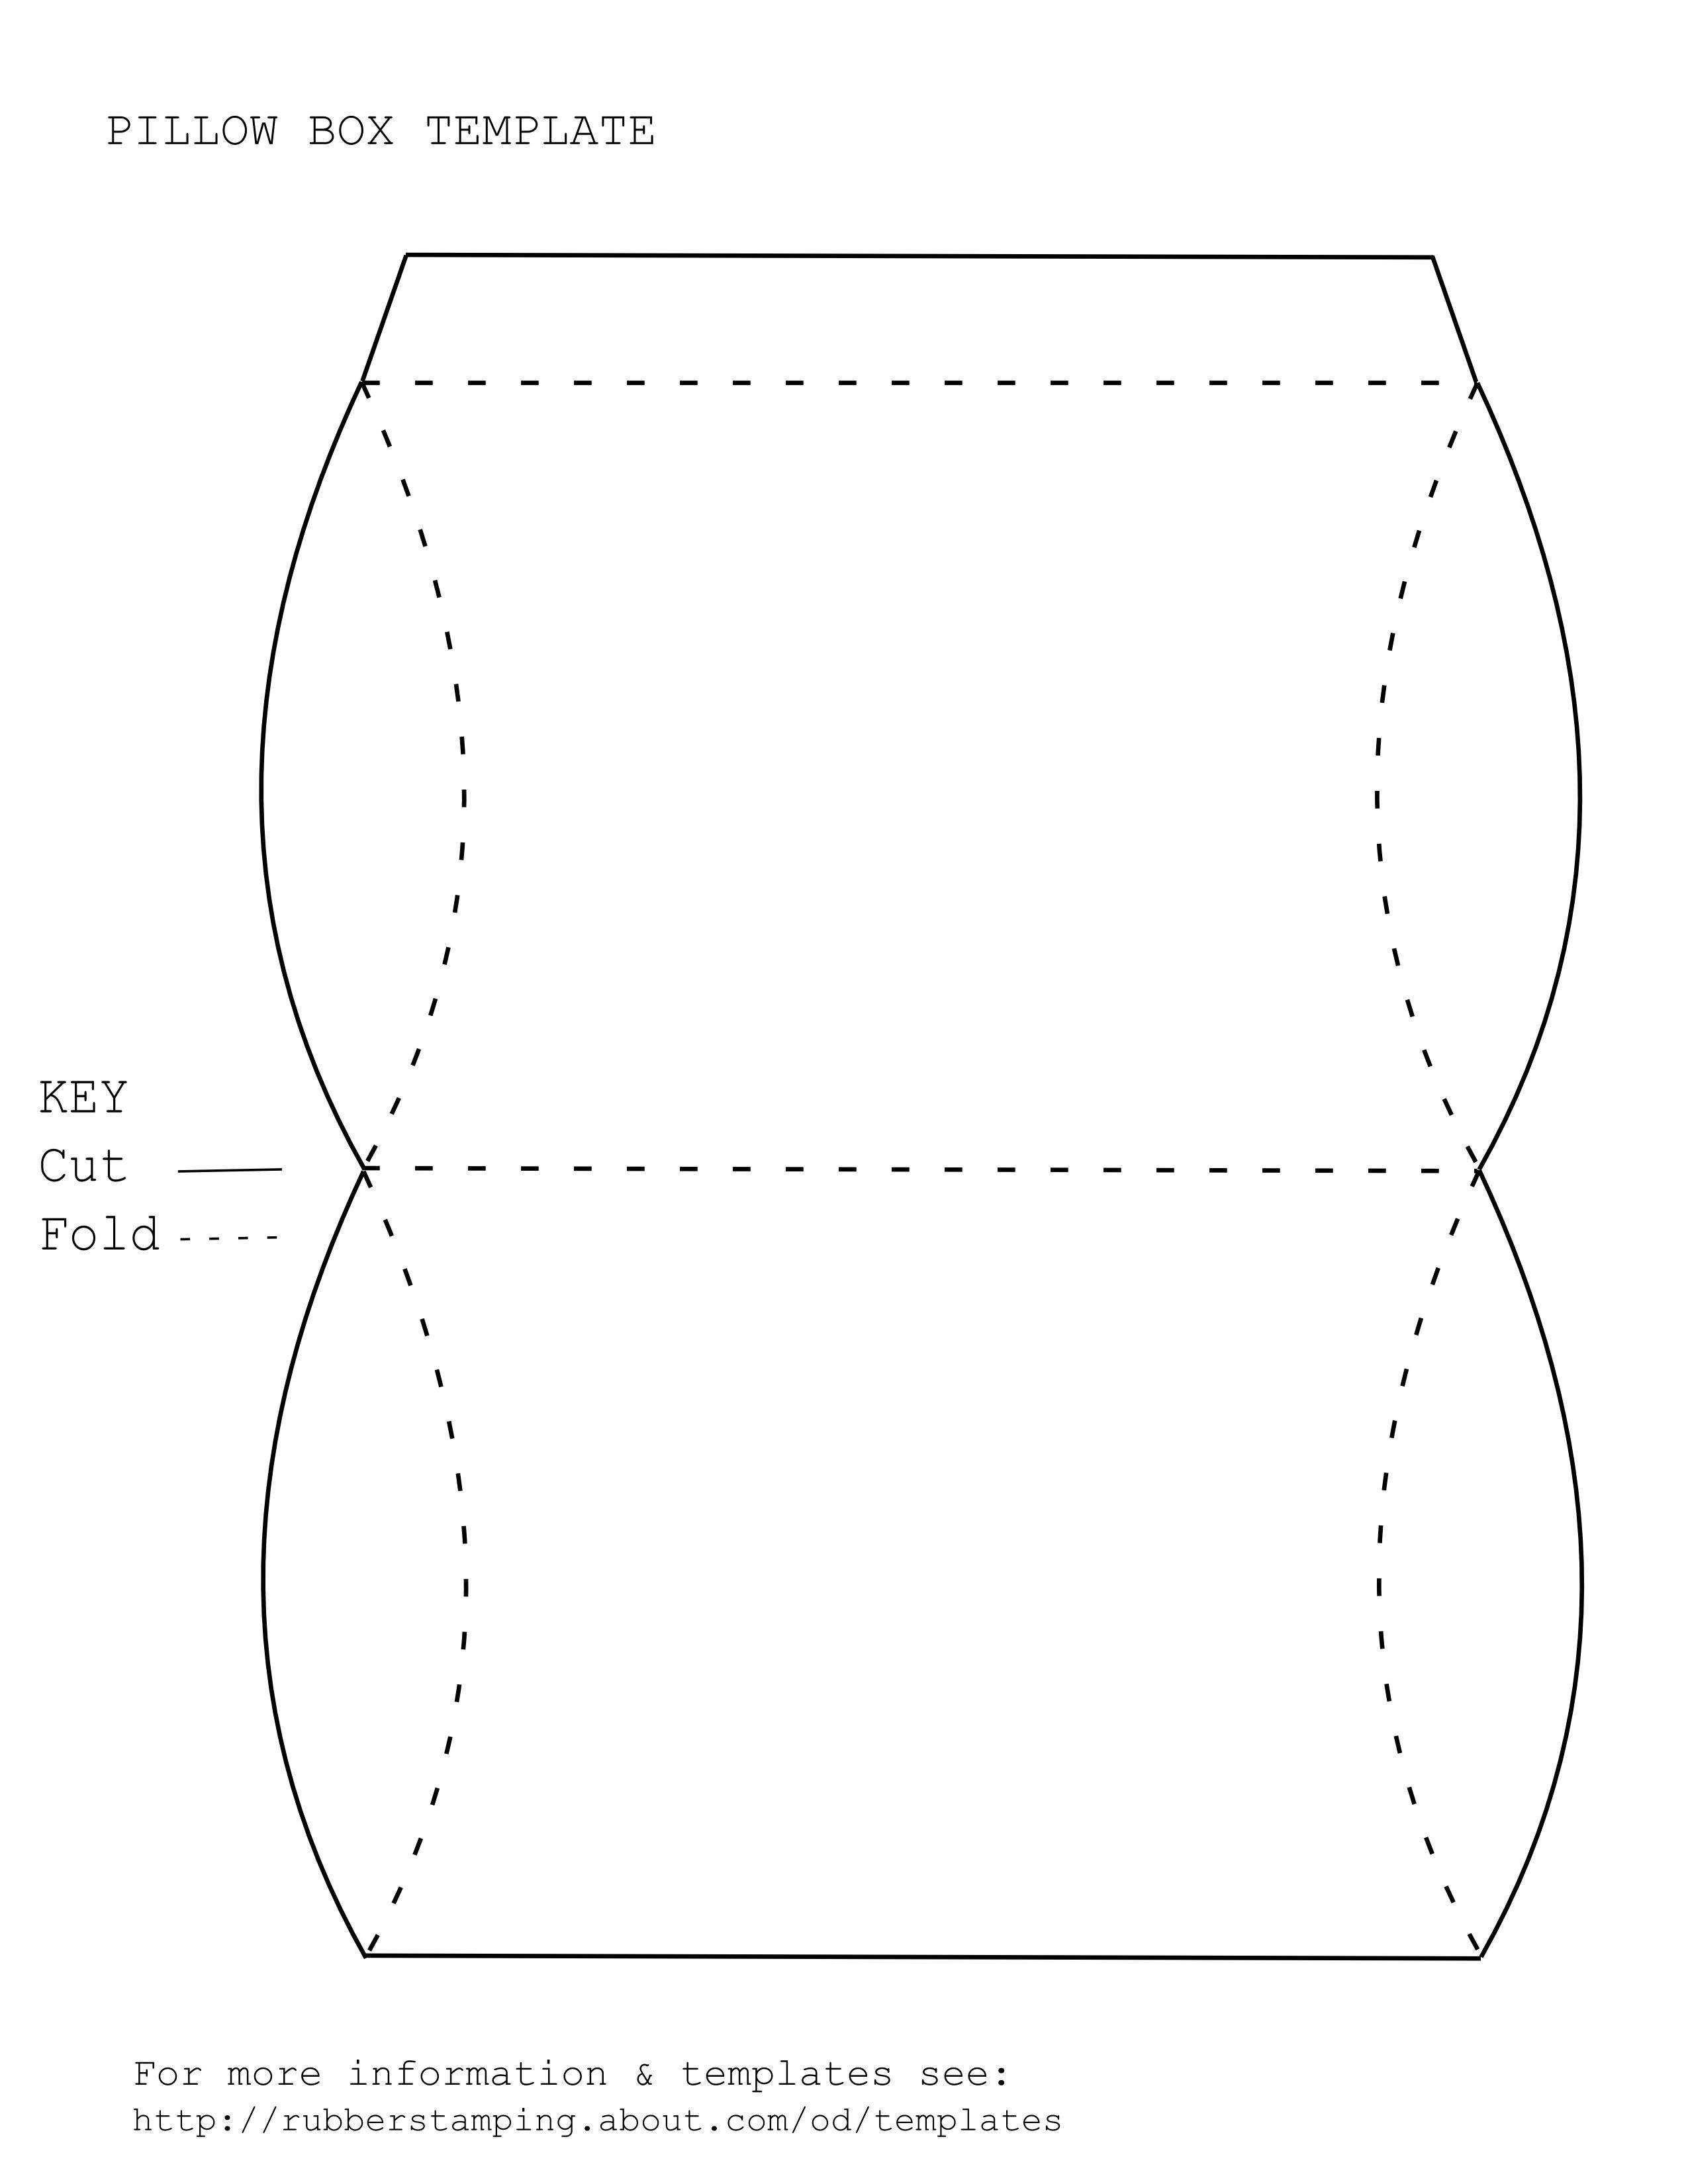 021 Free Printable Picture Frame Templates Ten Template Make - Free | Free Printable Versatiles Worksheets